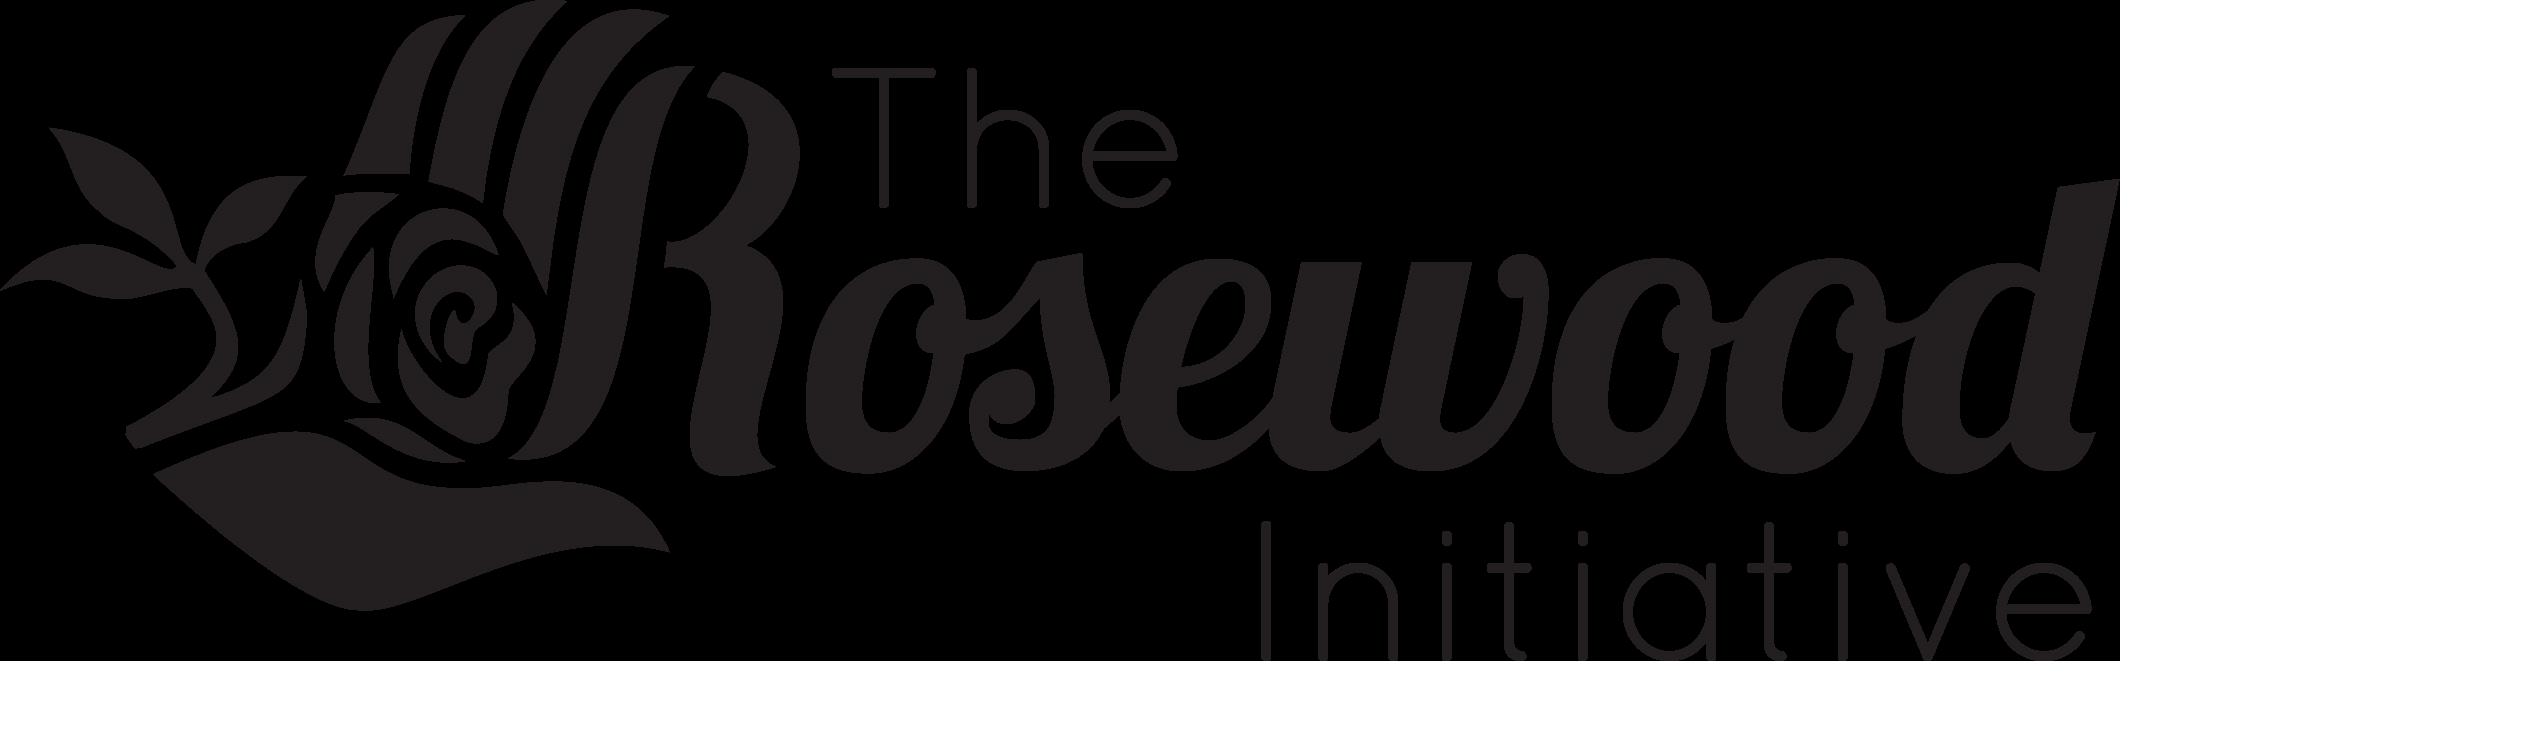 Rosewood Initiative logo